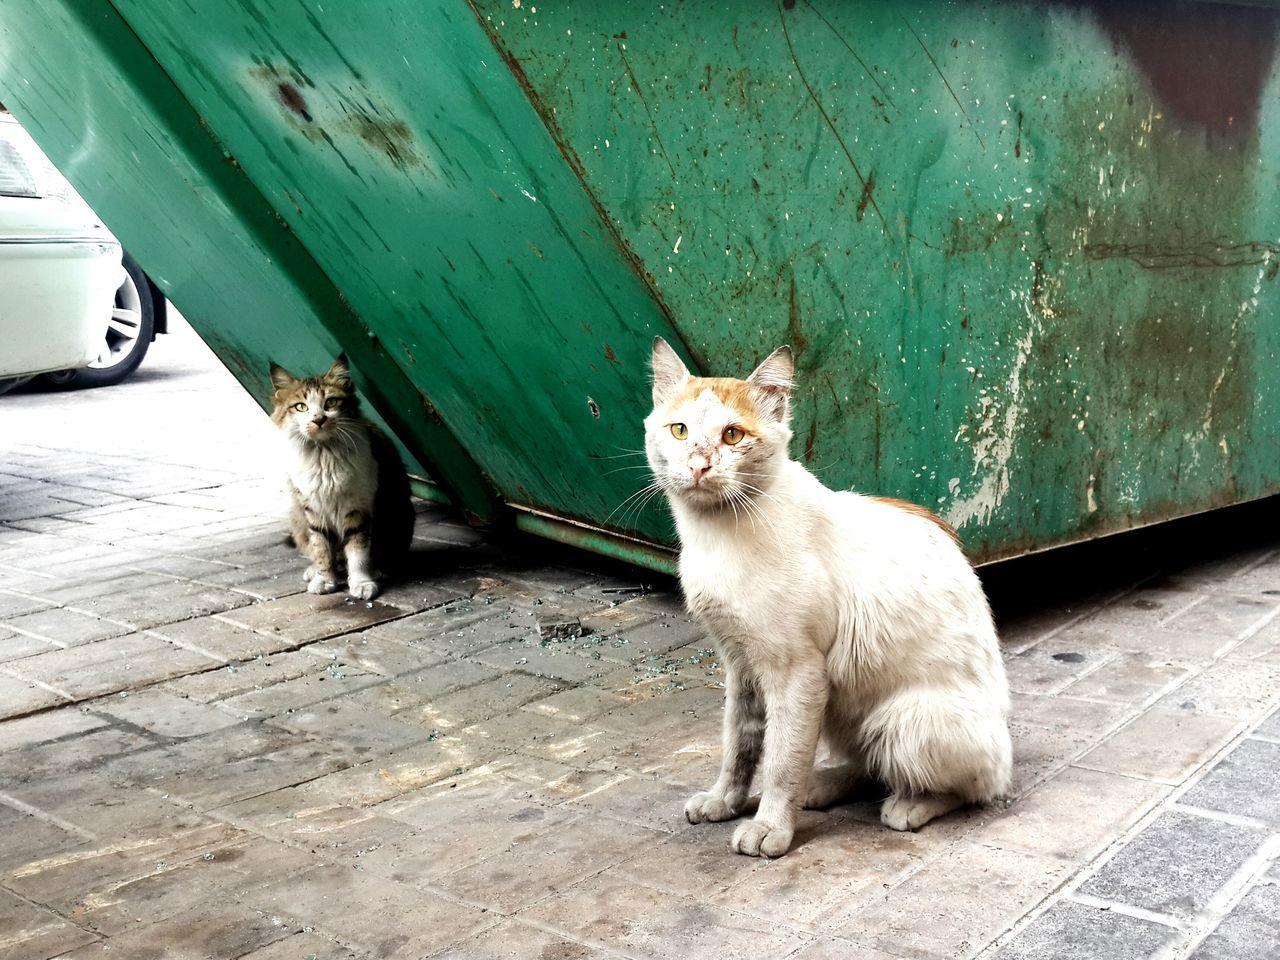 Portrait Of Cats Sitting On Street